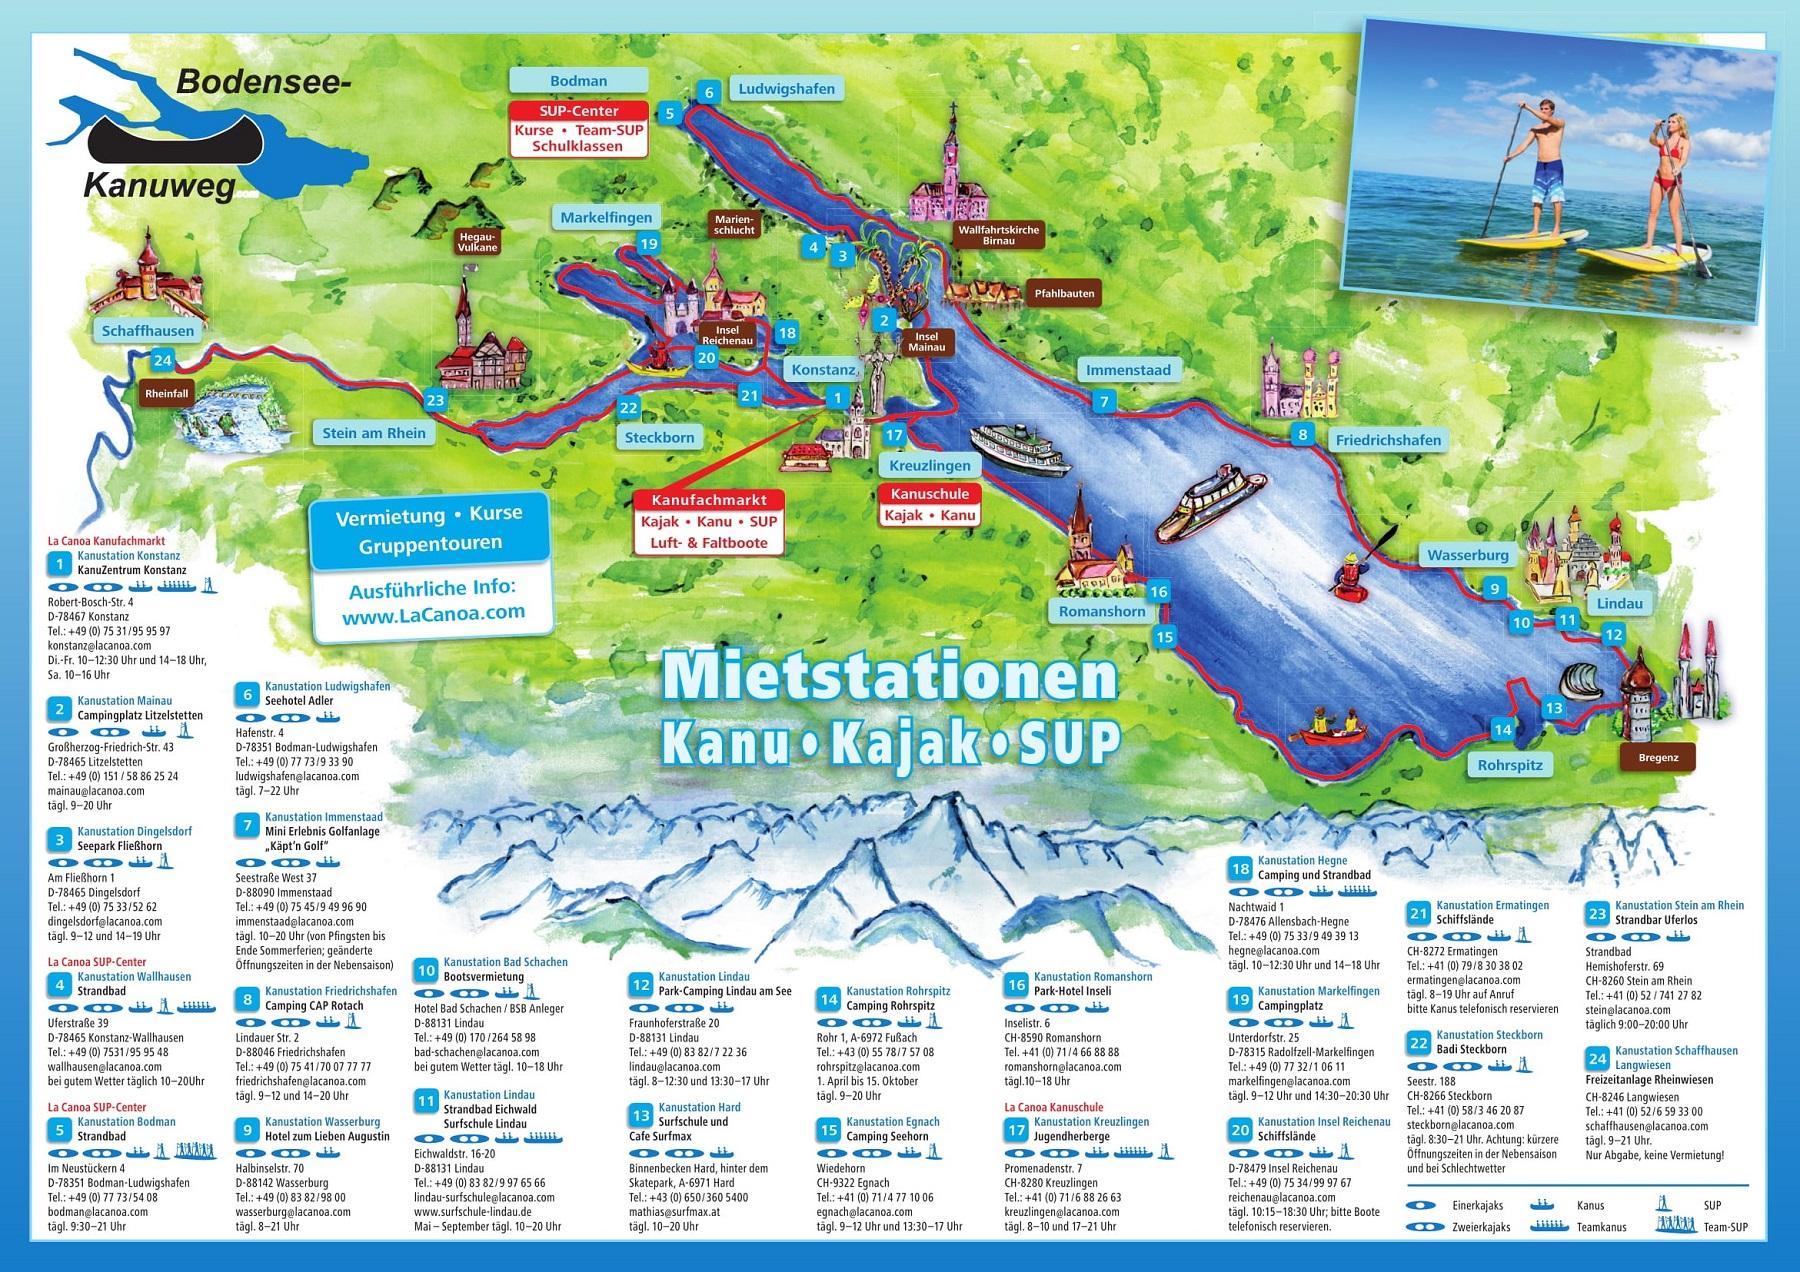 Bodensee-Kanuweg-Mietstationen